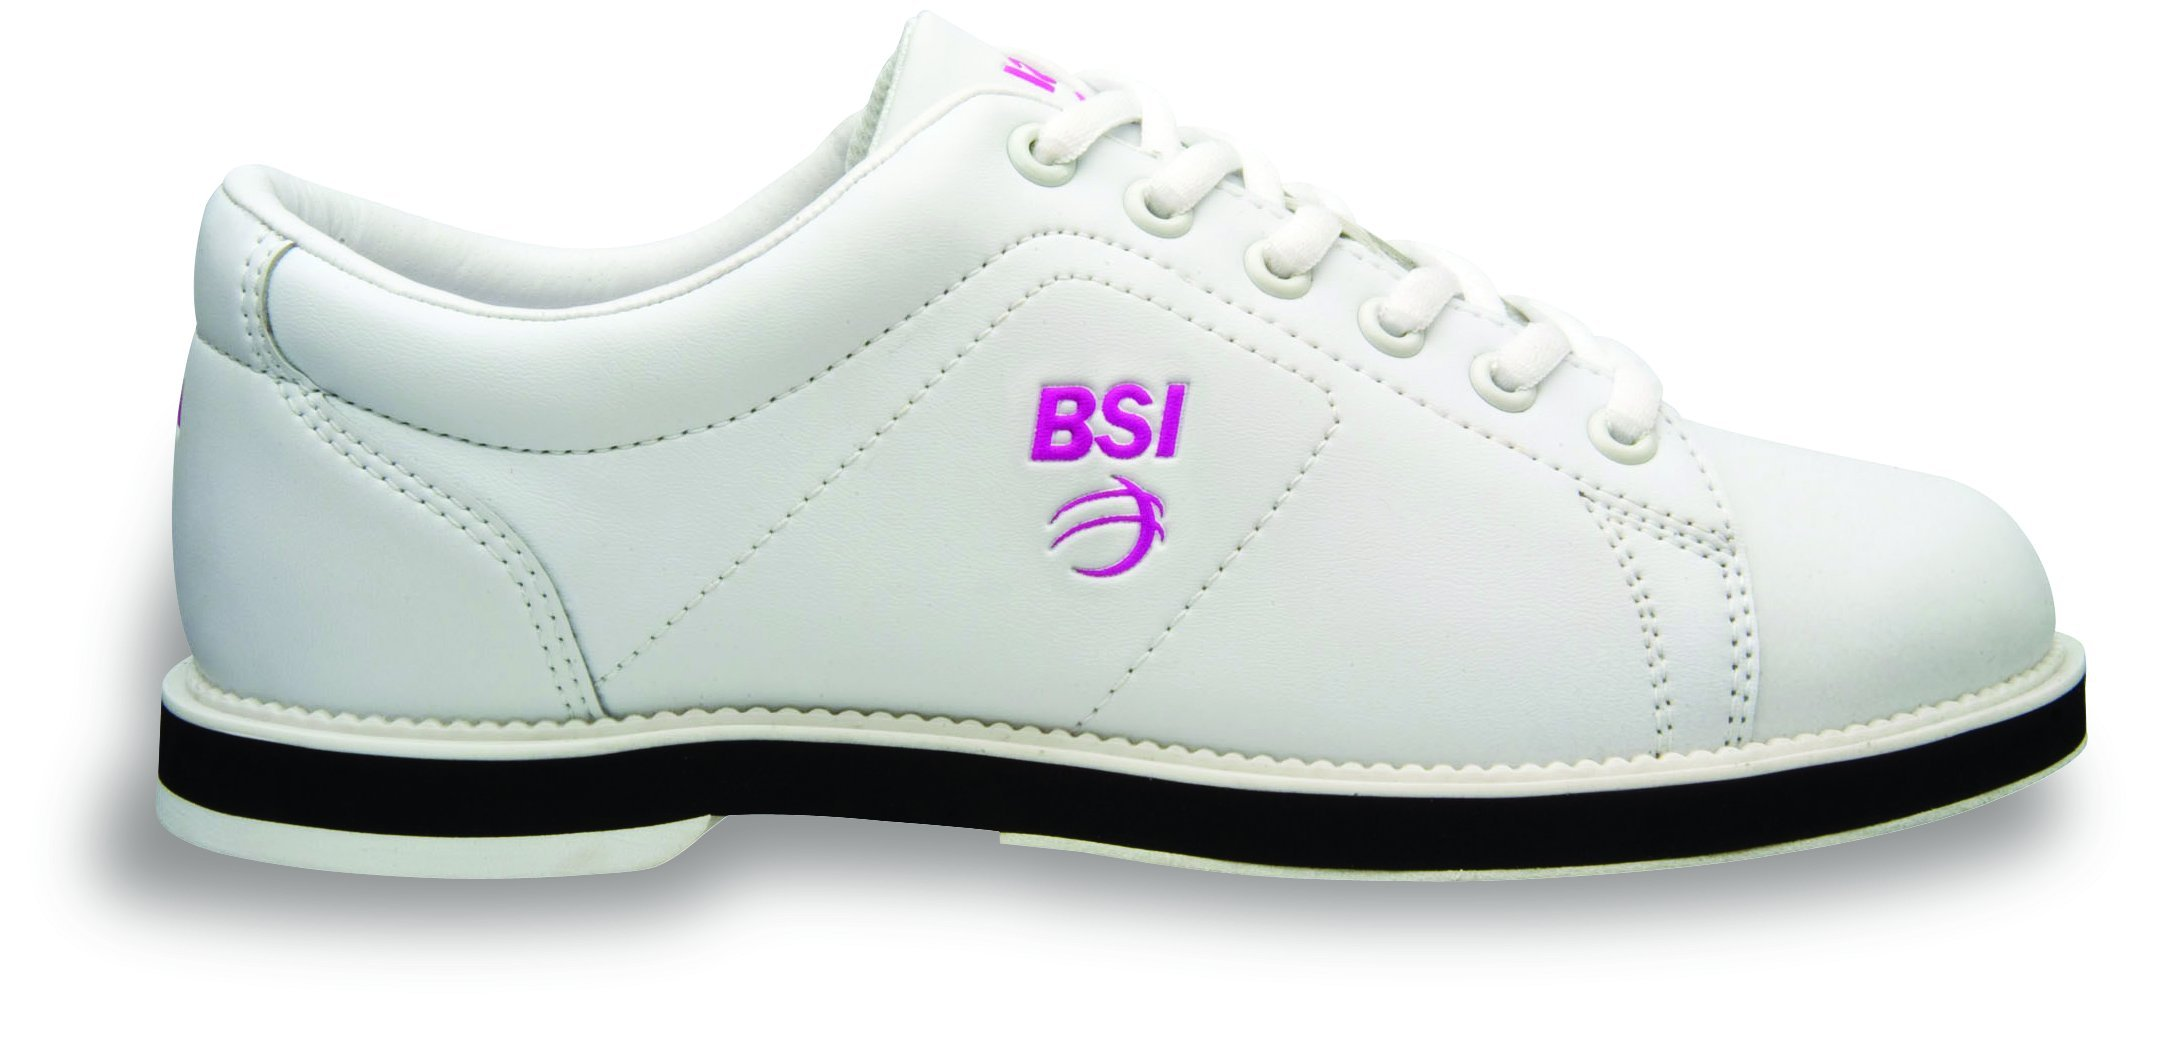 BSI Women's #650 Bowling Shoes, White, Size 11.0